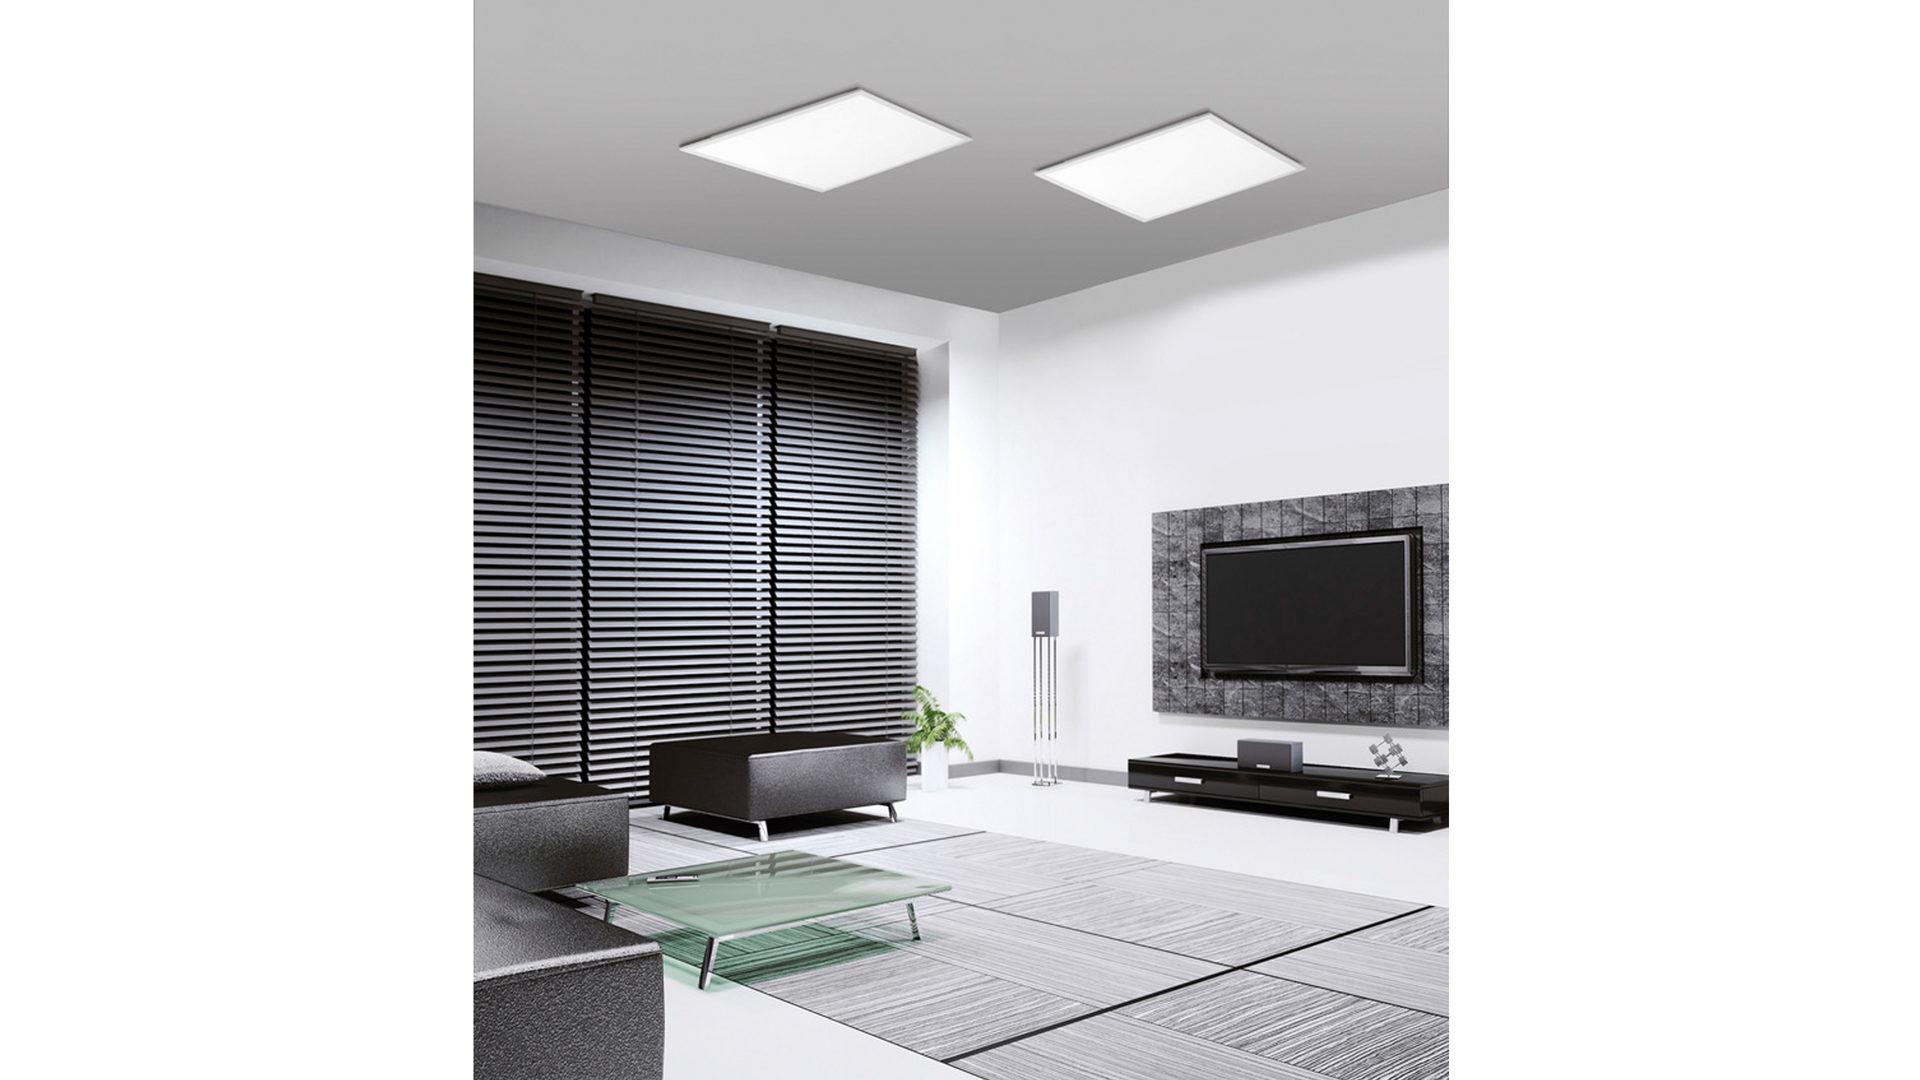 Möbel Bernskötter Mülheim, Räume, Küche, Lampen + Leuchten, LED ...